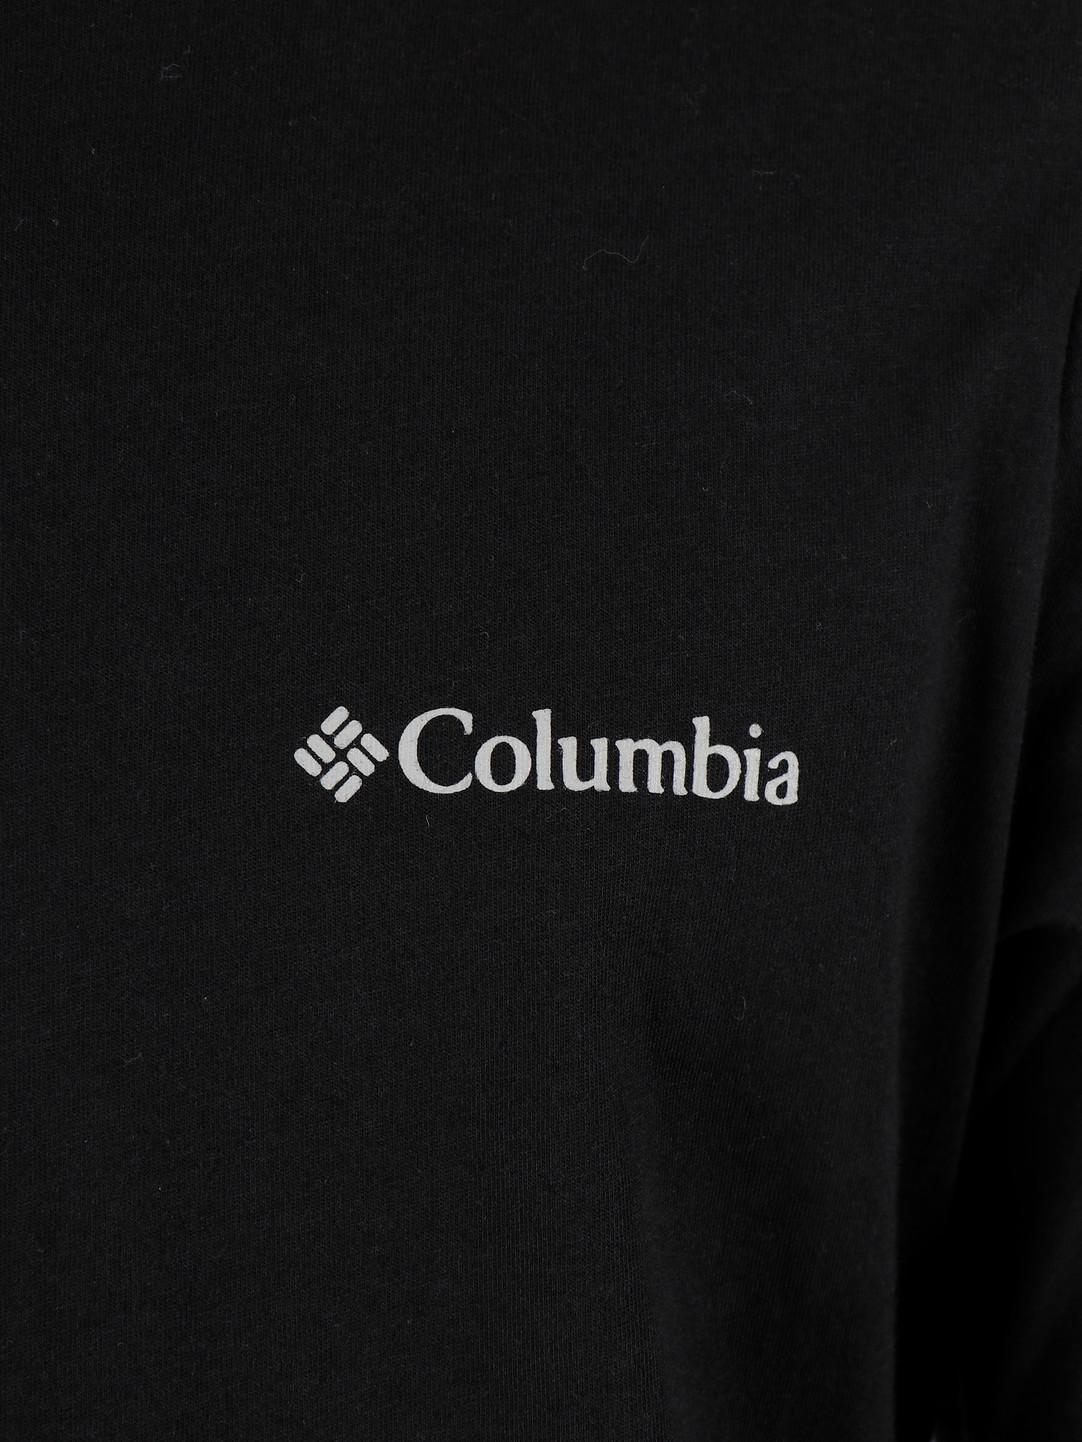 Columbia Columbia Columbia Lodge Longsleeve Graphic Tee Black Sleeve H 1867302010